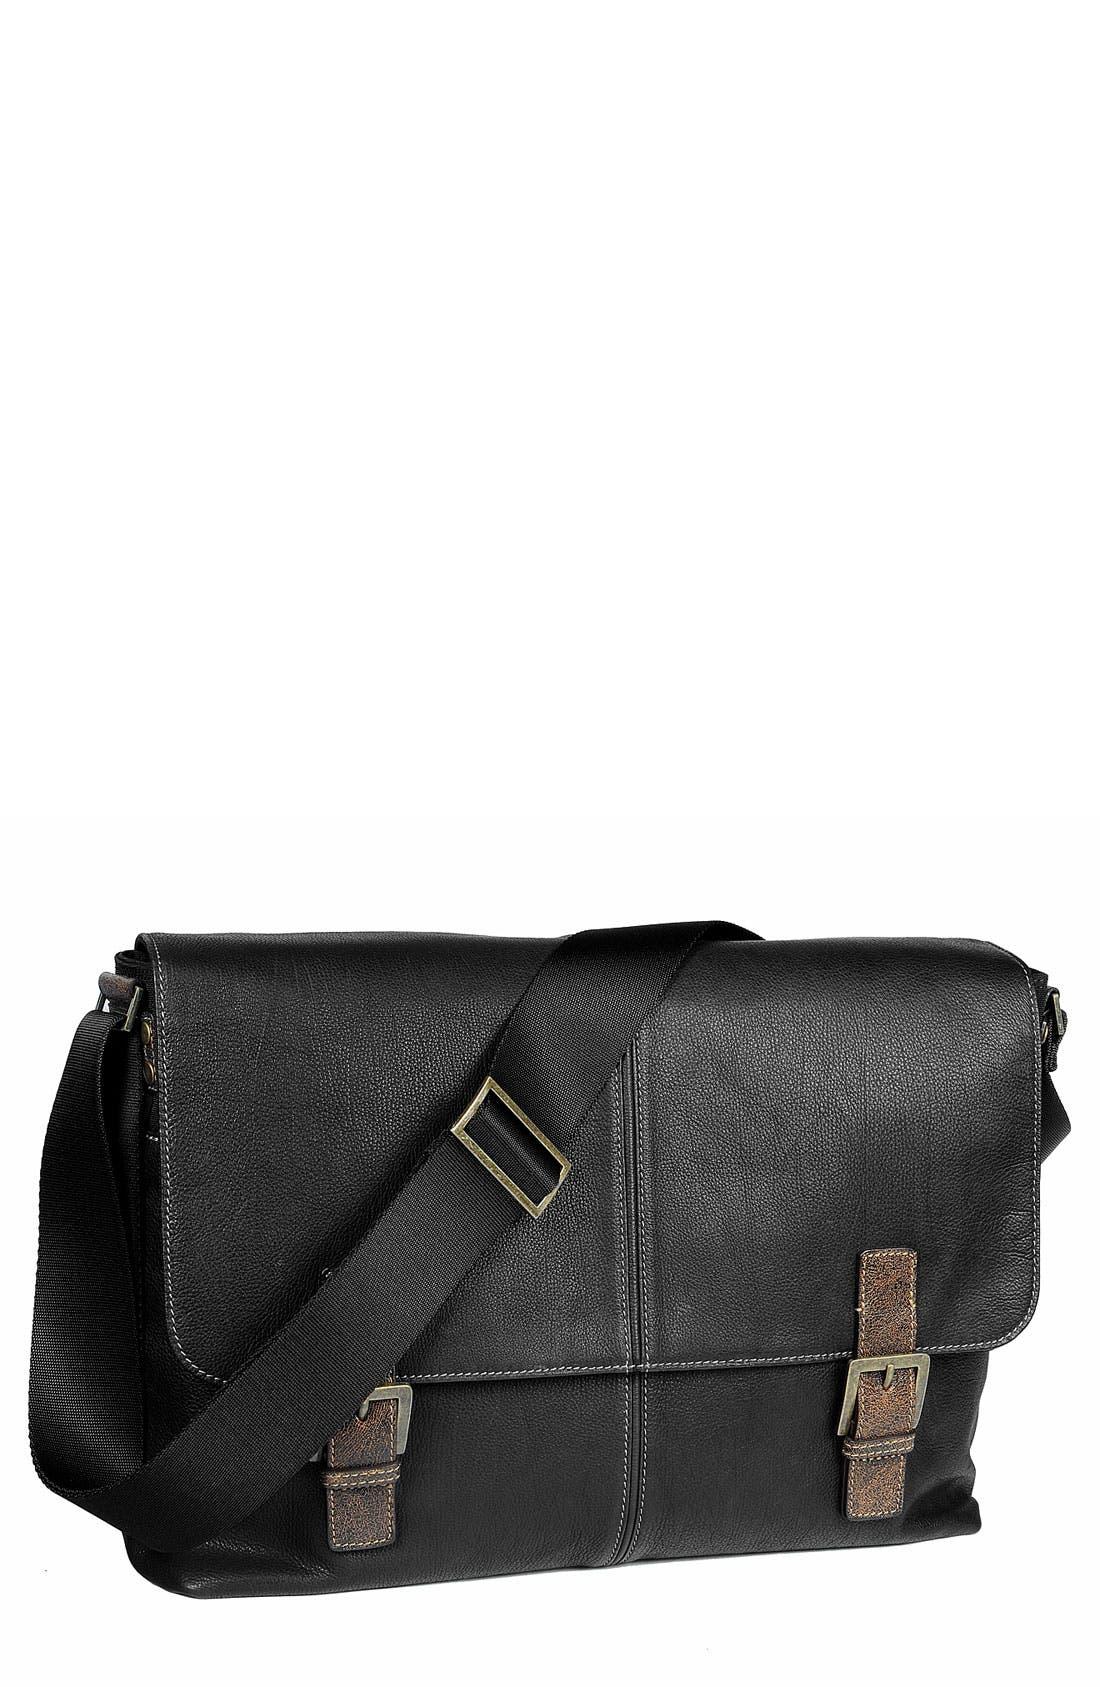 Alternate Image 1 Selected - Boconi Double Buckle Messenger Bag